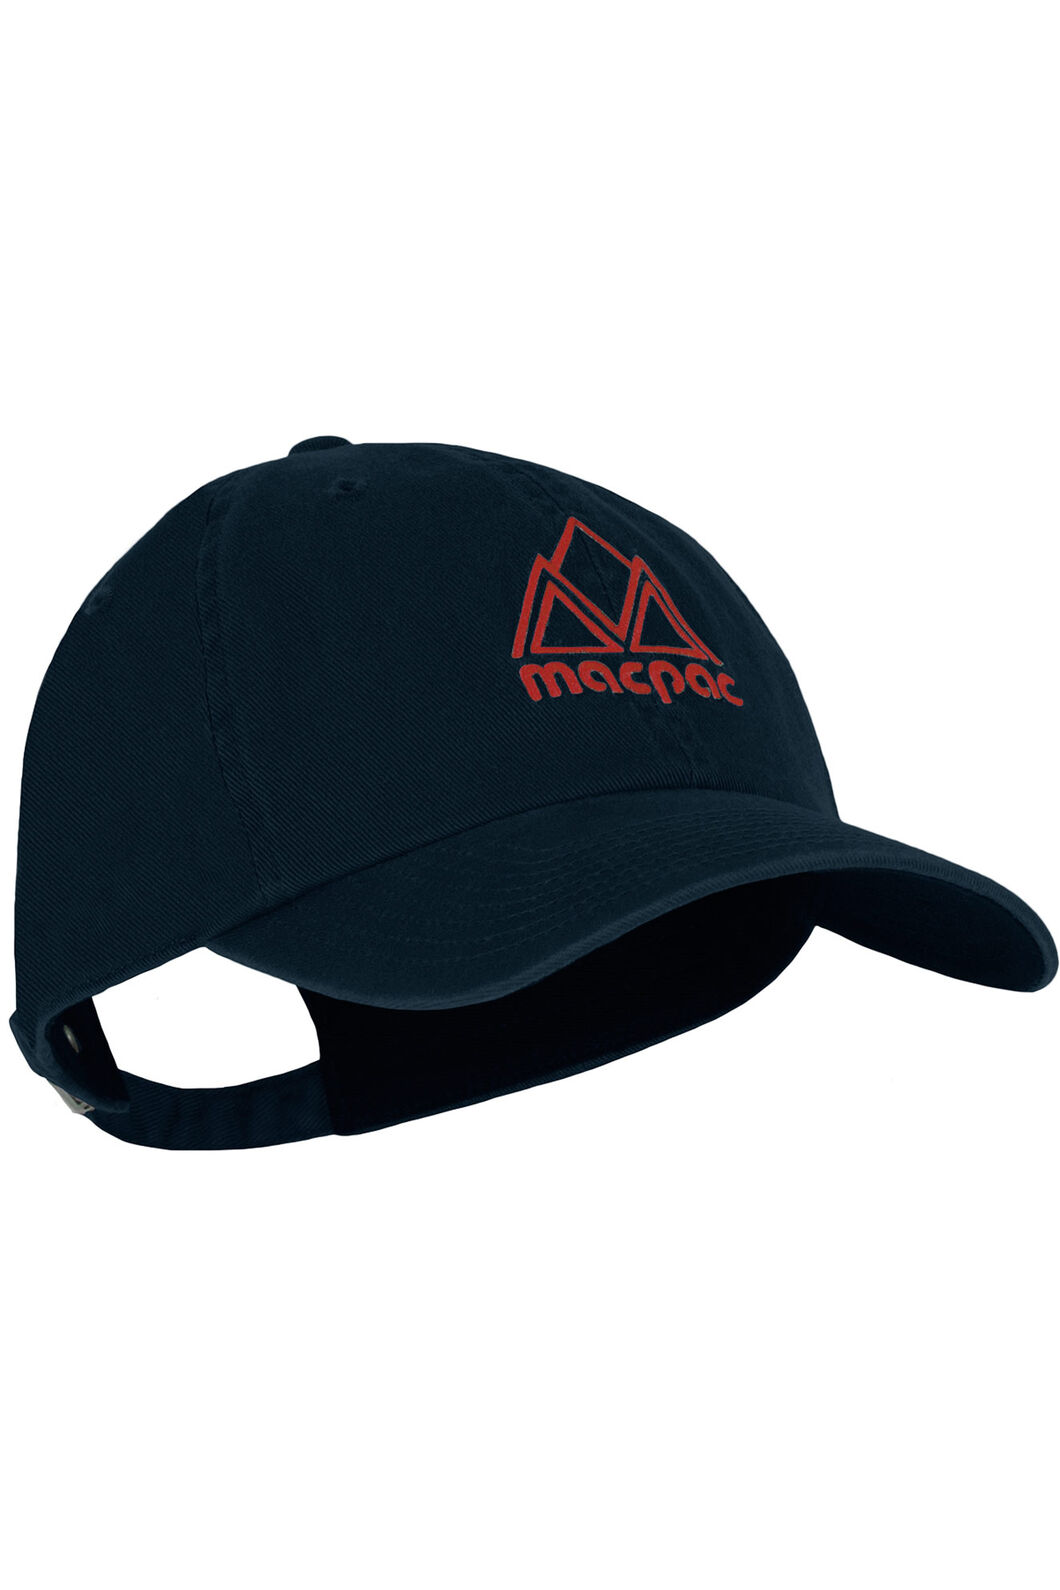 Macpac Vintage Cap, Black Iris/Scarlet Sage, hi-res